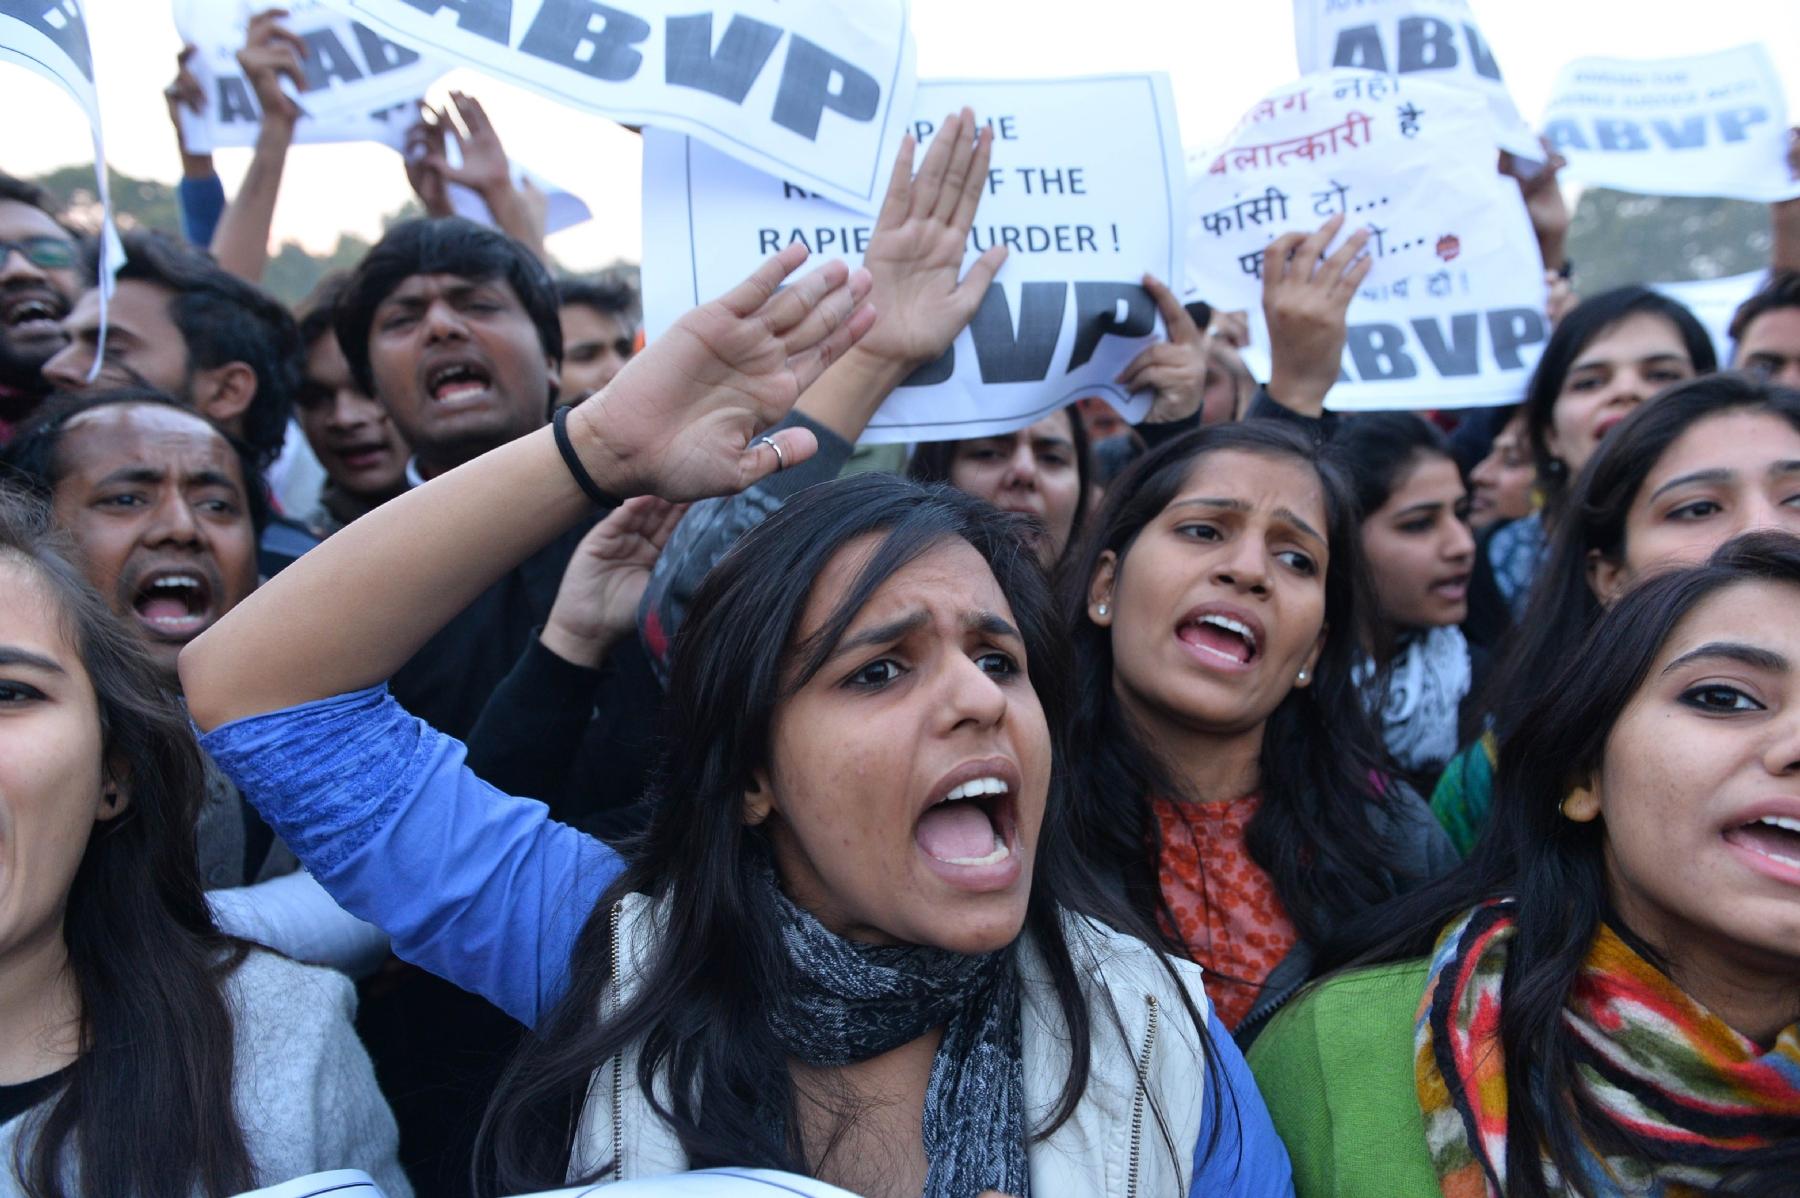 Juvenile in Dec 16 gangrape case walks free